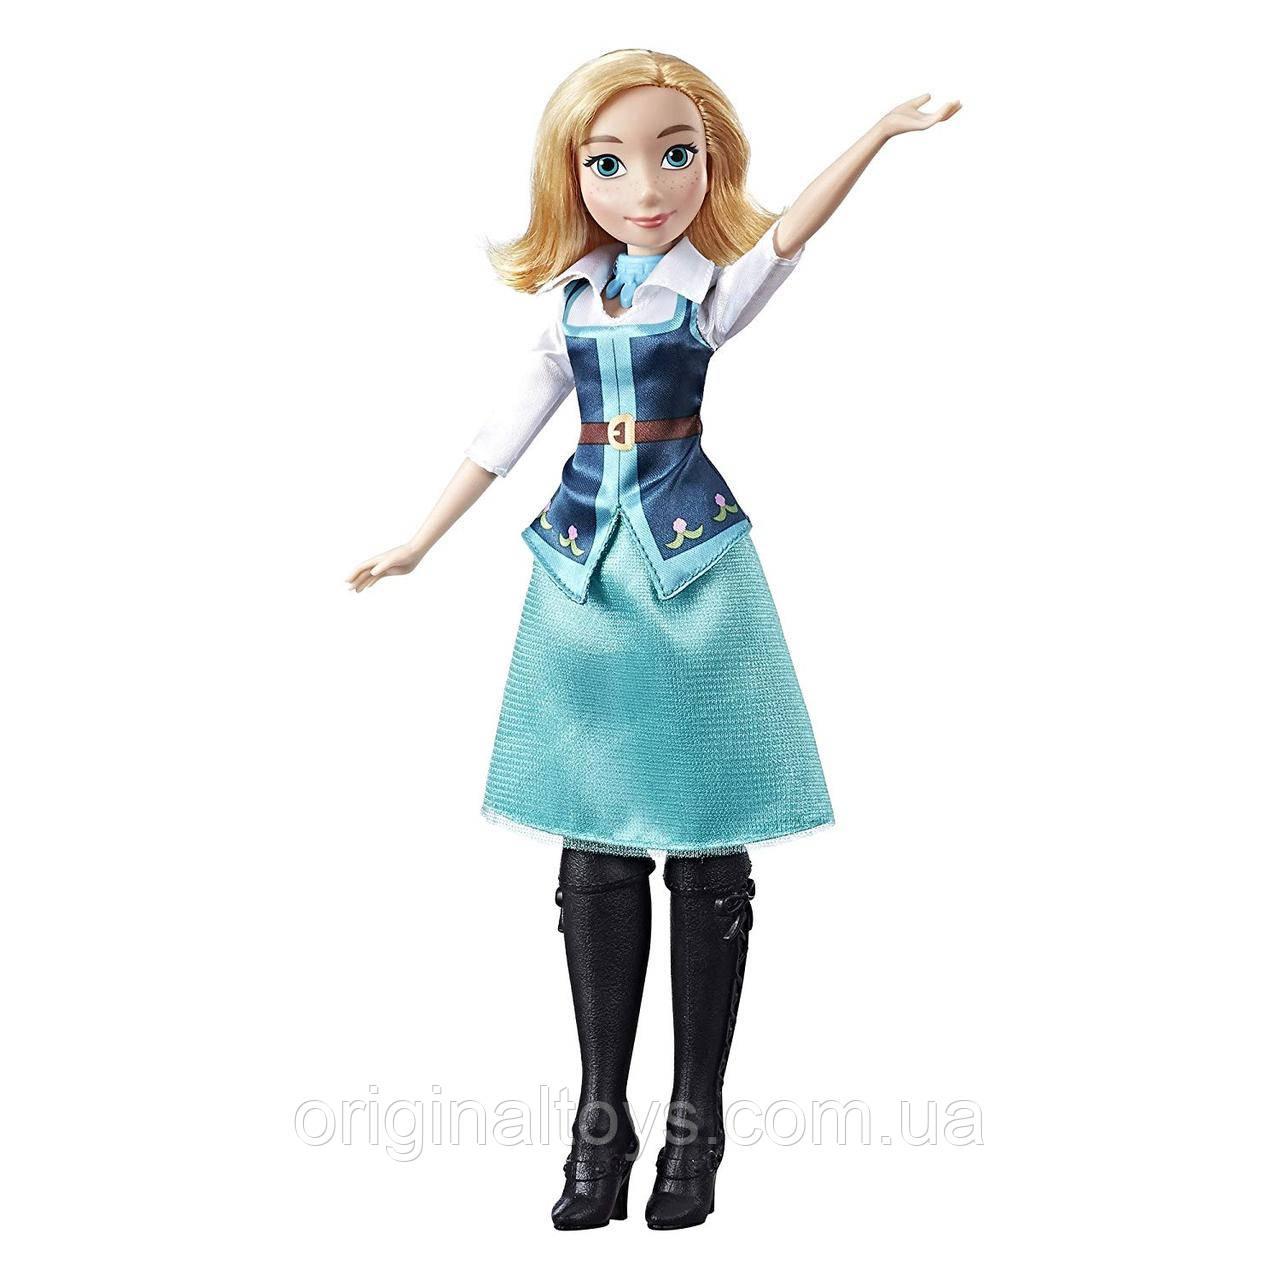 Лялька Наомі Тернер - Олена з Авалора - Disney Elena of Avalor Naomi Turner Hasbro